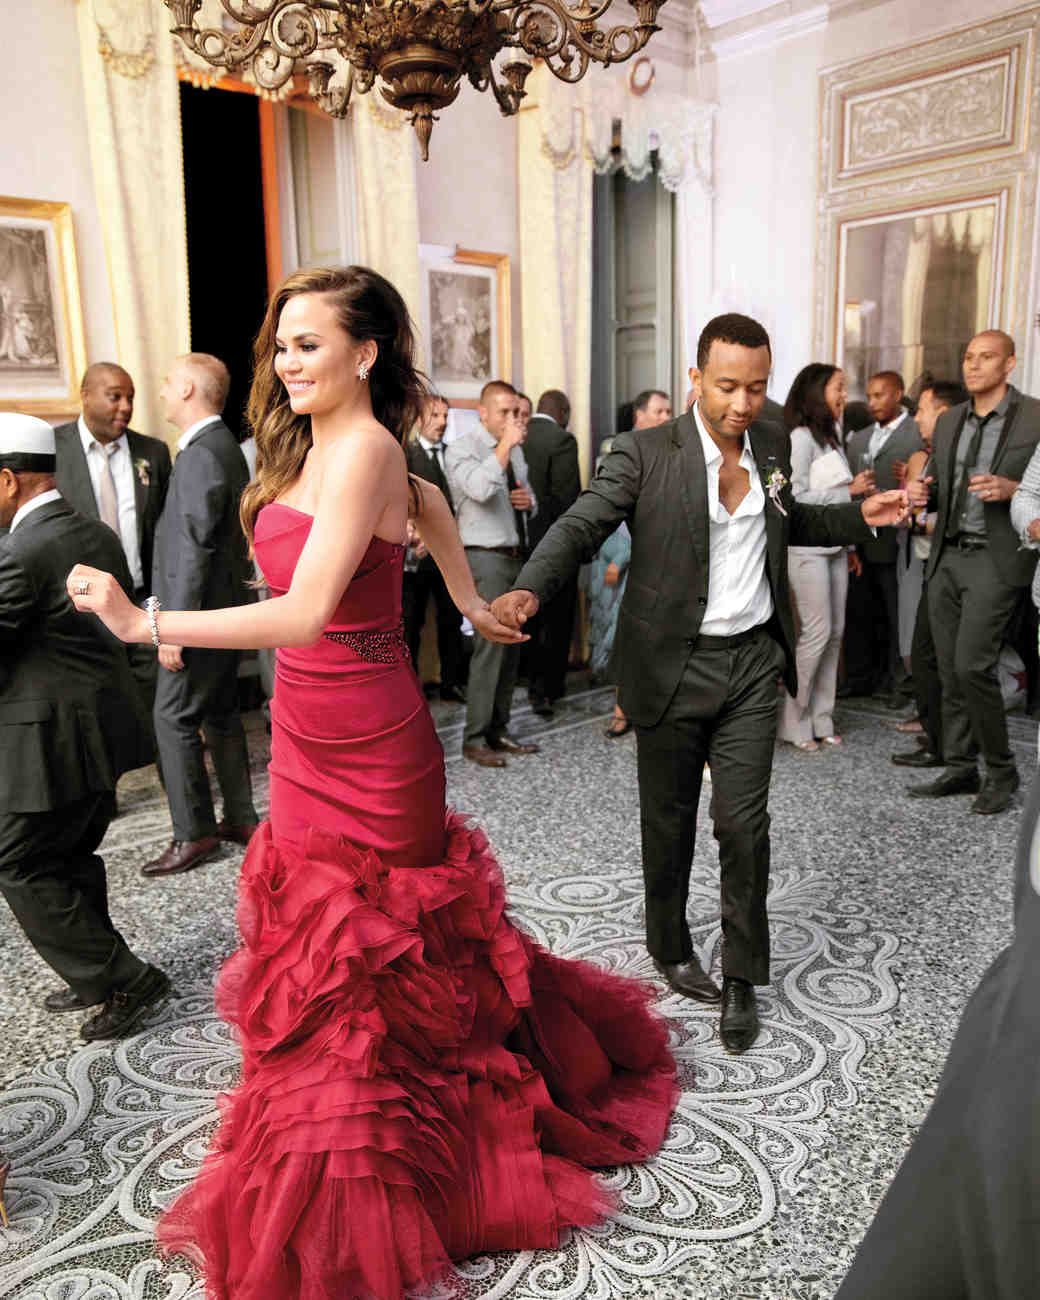 red wedding dresses red wedding dresses Chrissy Teigen s Red Wedding Dress